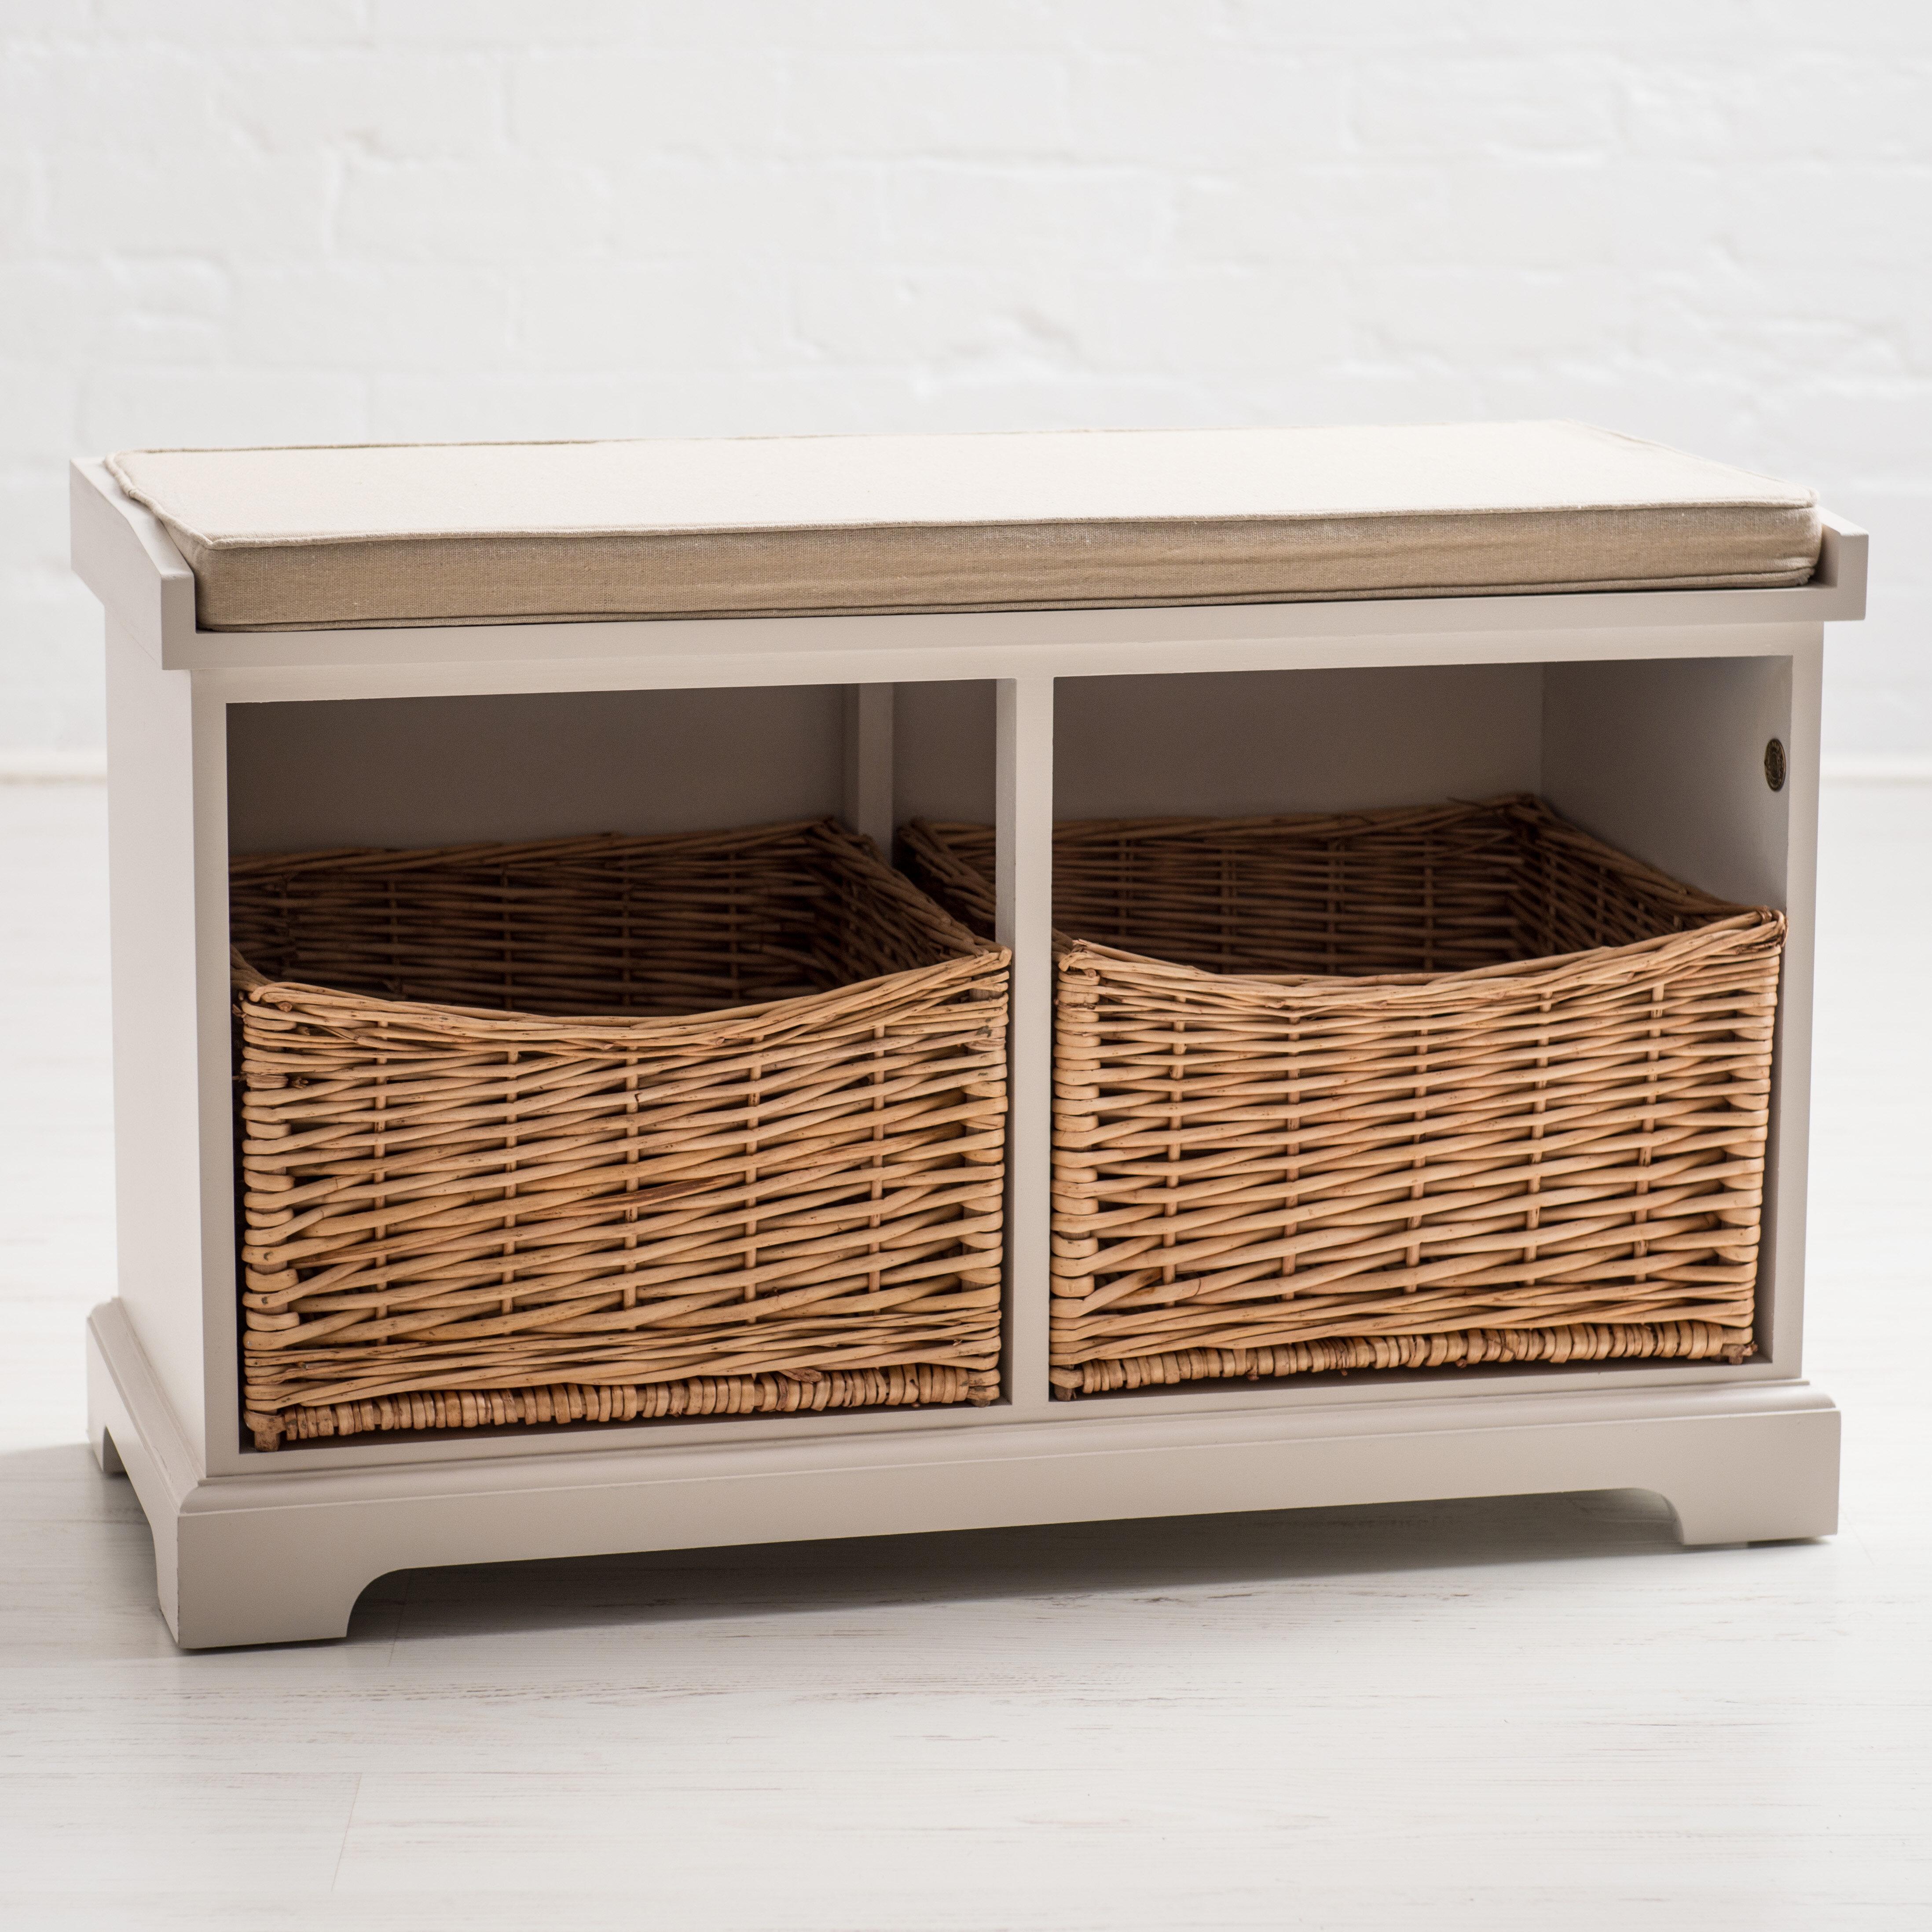 Brambly Cottage Lynton 2 Basket Storage Bench U0026 Reviews   Wayfair.co.uk